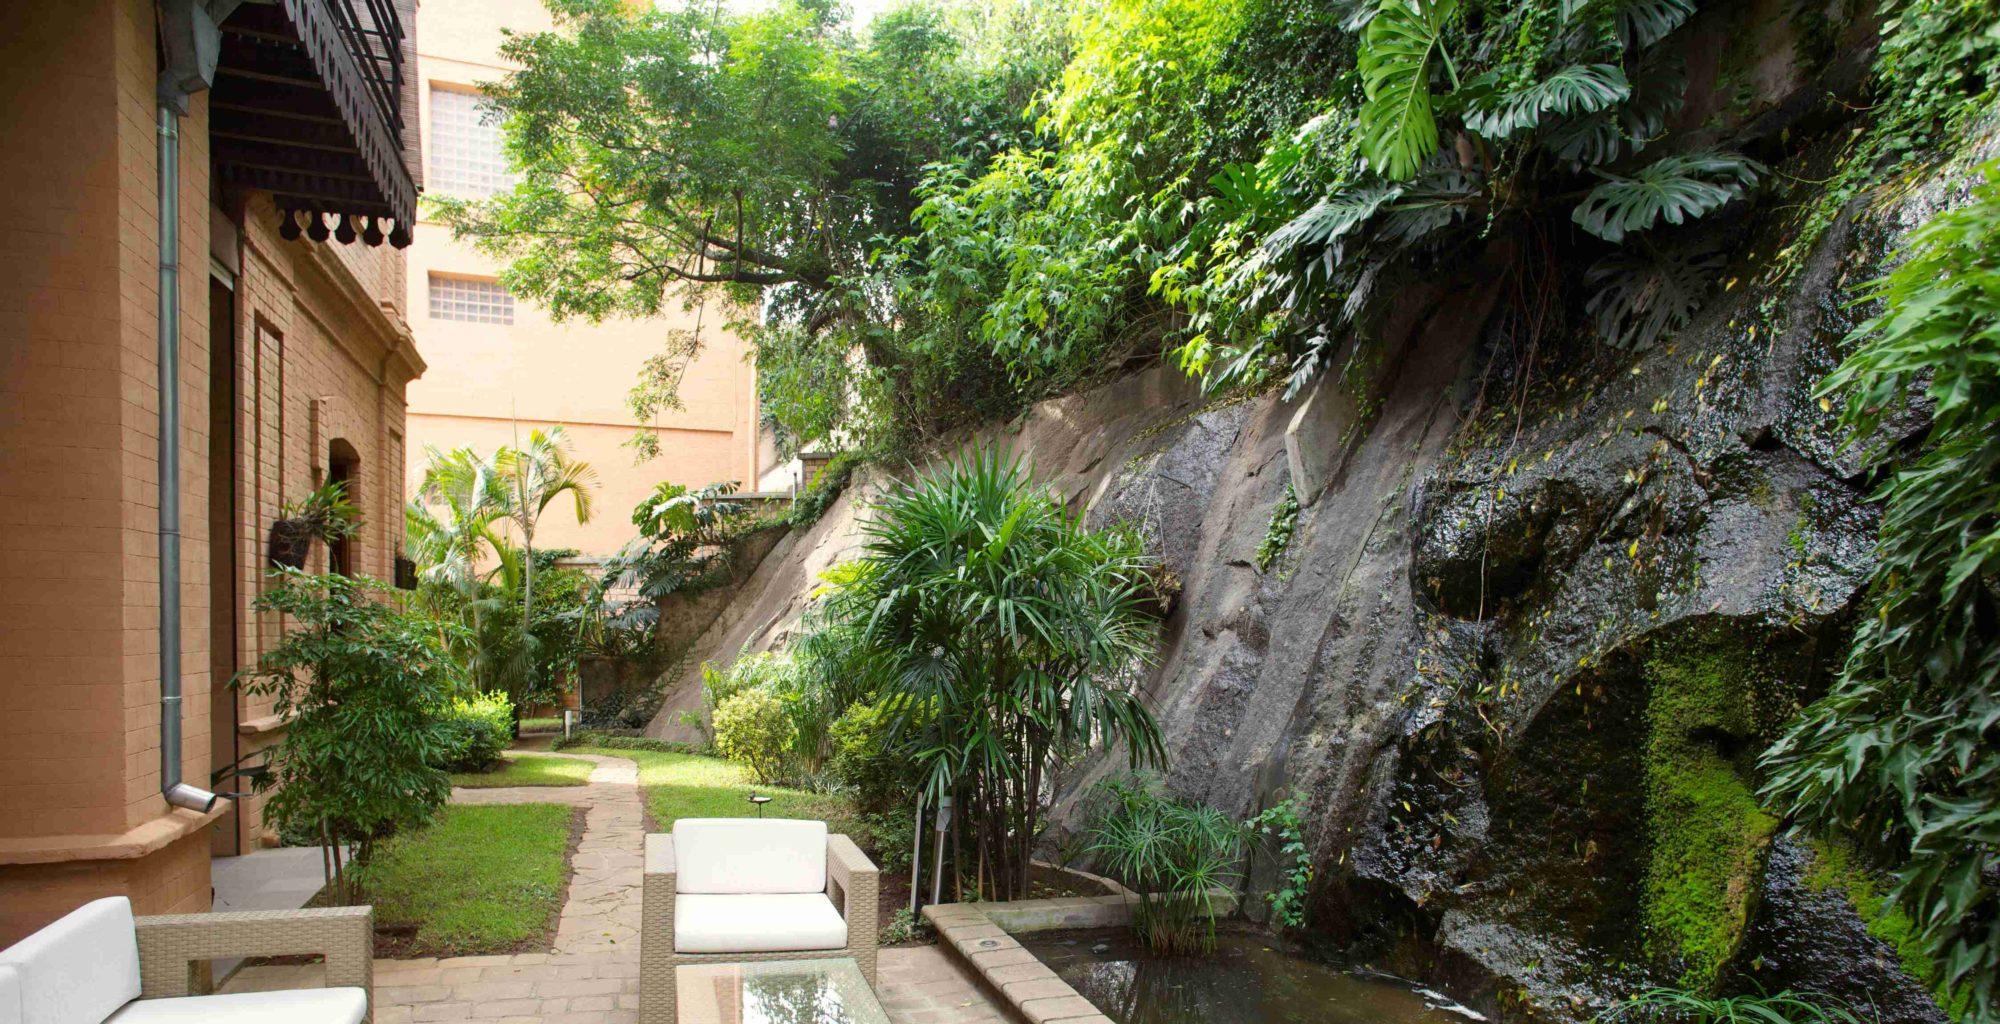 Maison Gallieni Madagascar Garden